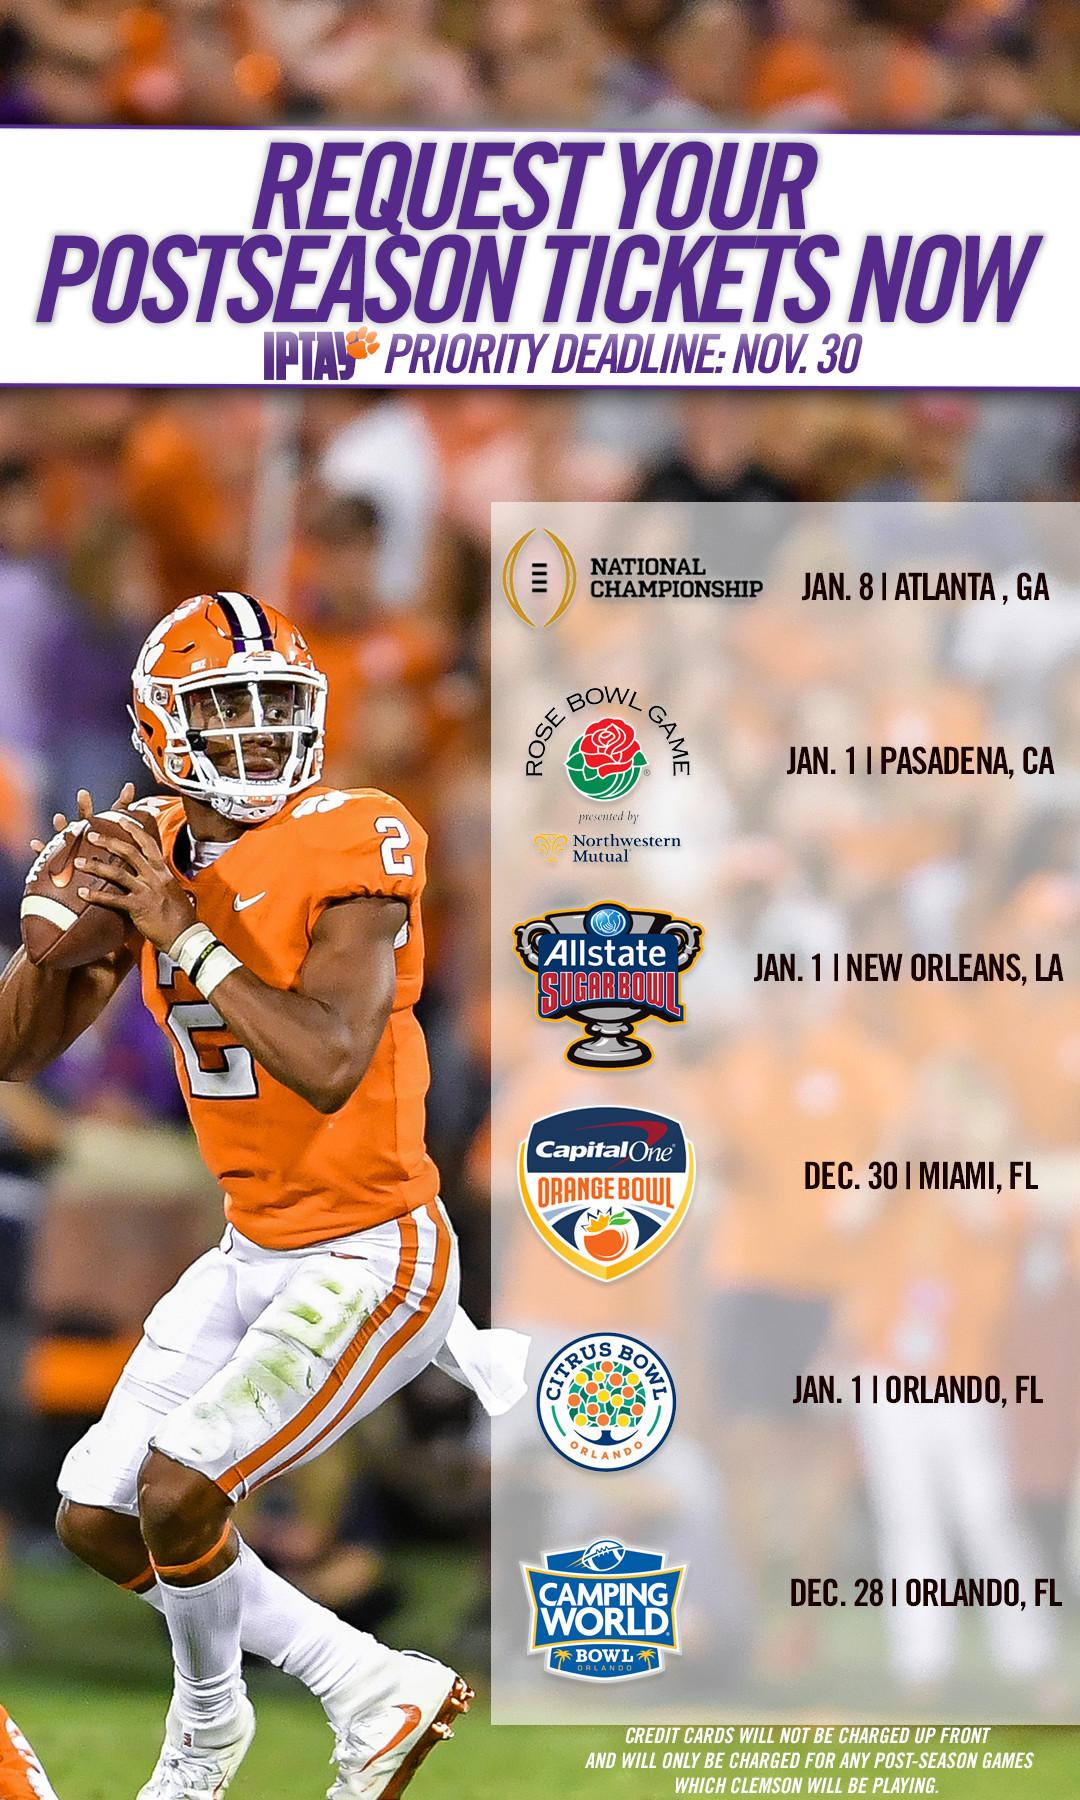 Clemson Postseason and Bowl Ticket Information